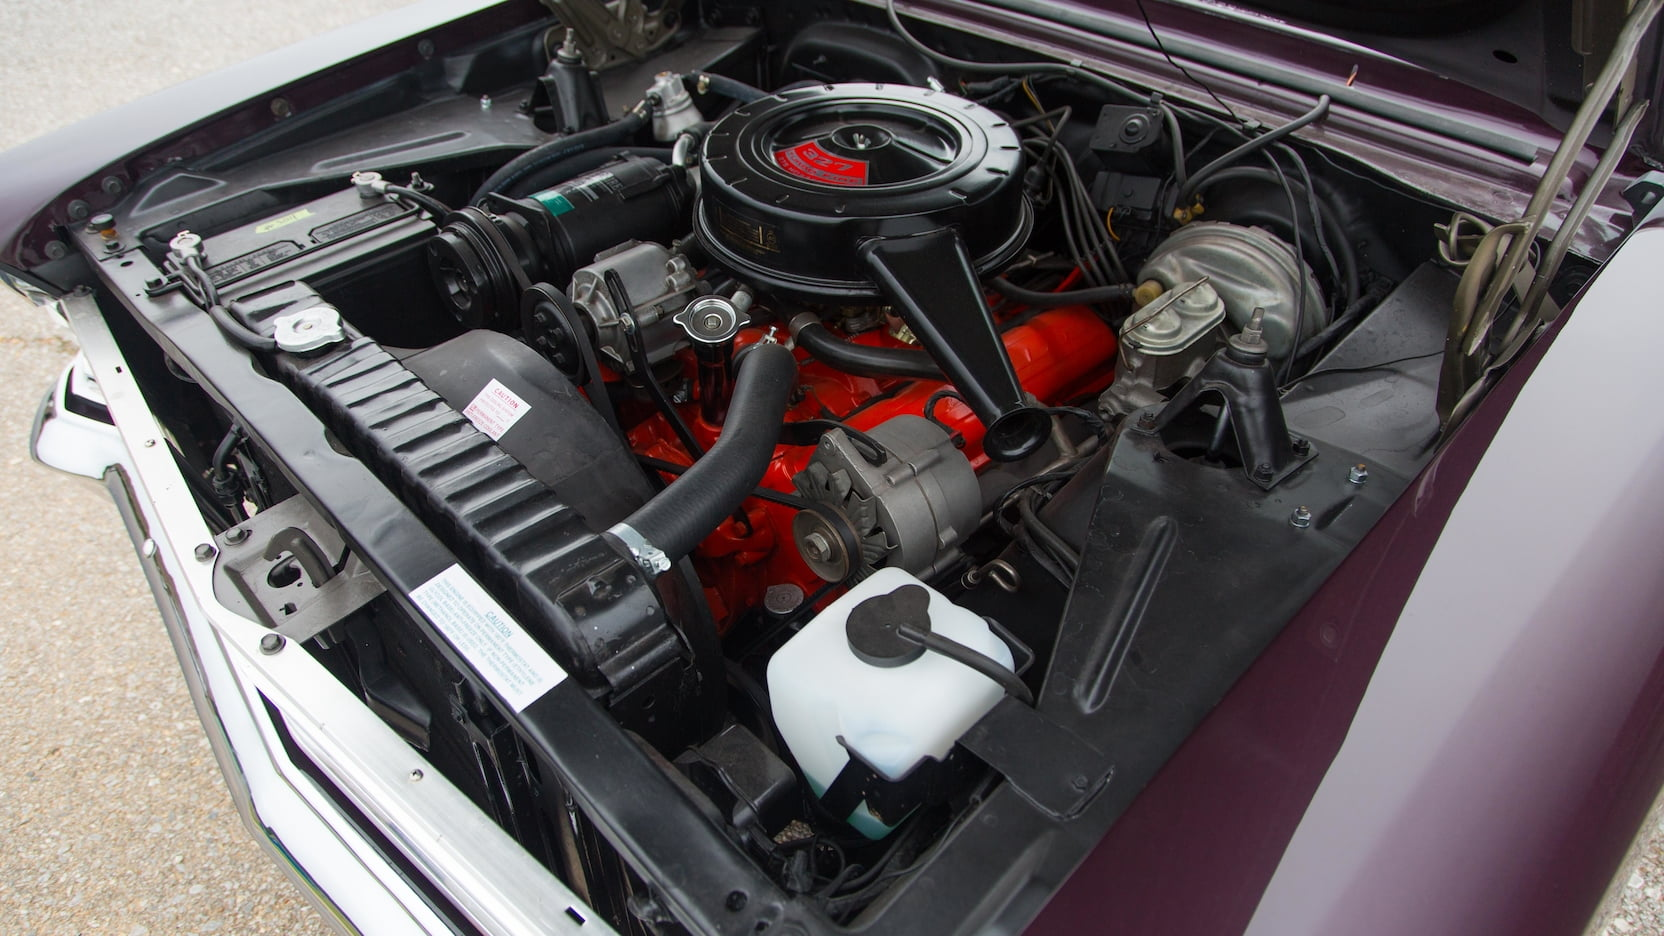 1967 Chevrolet Nova SS engine 327